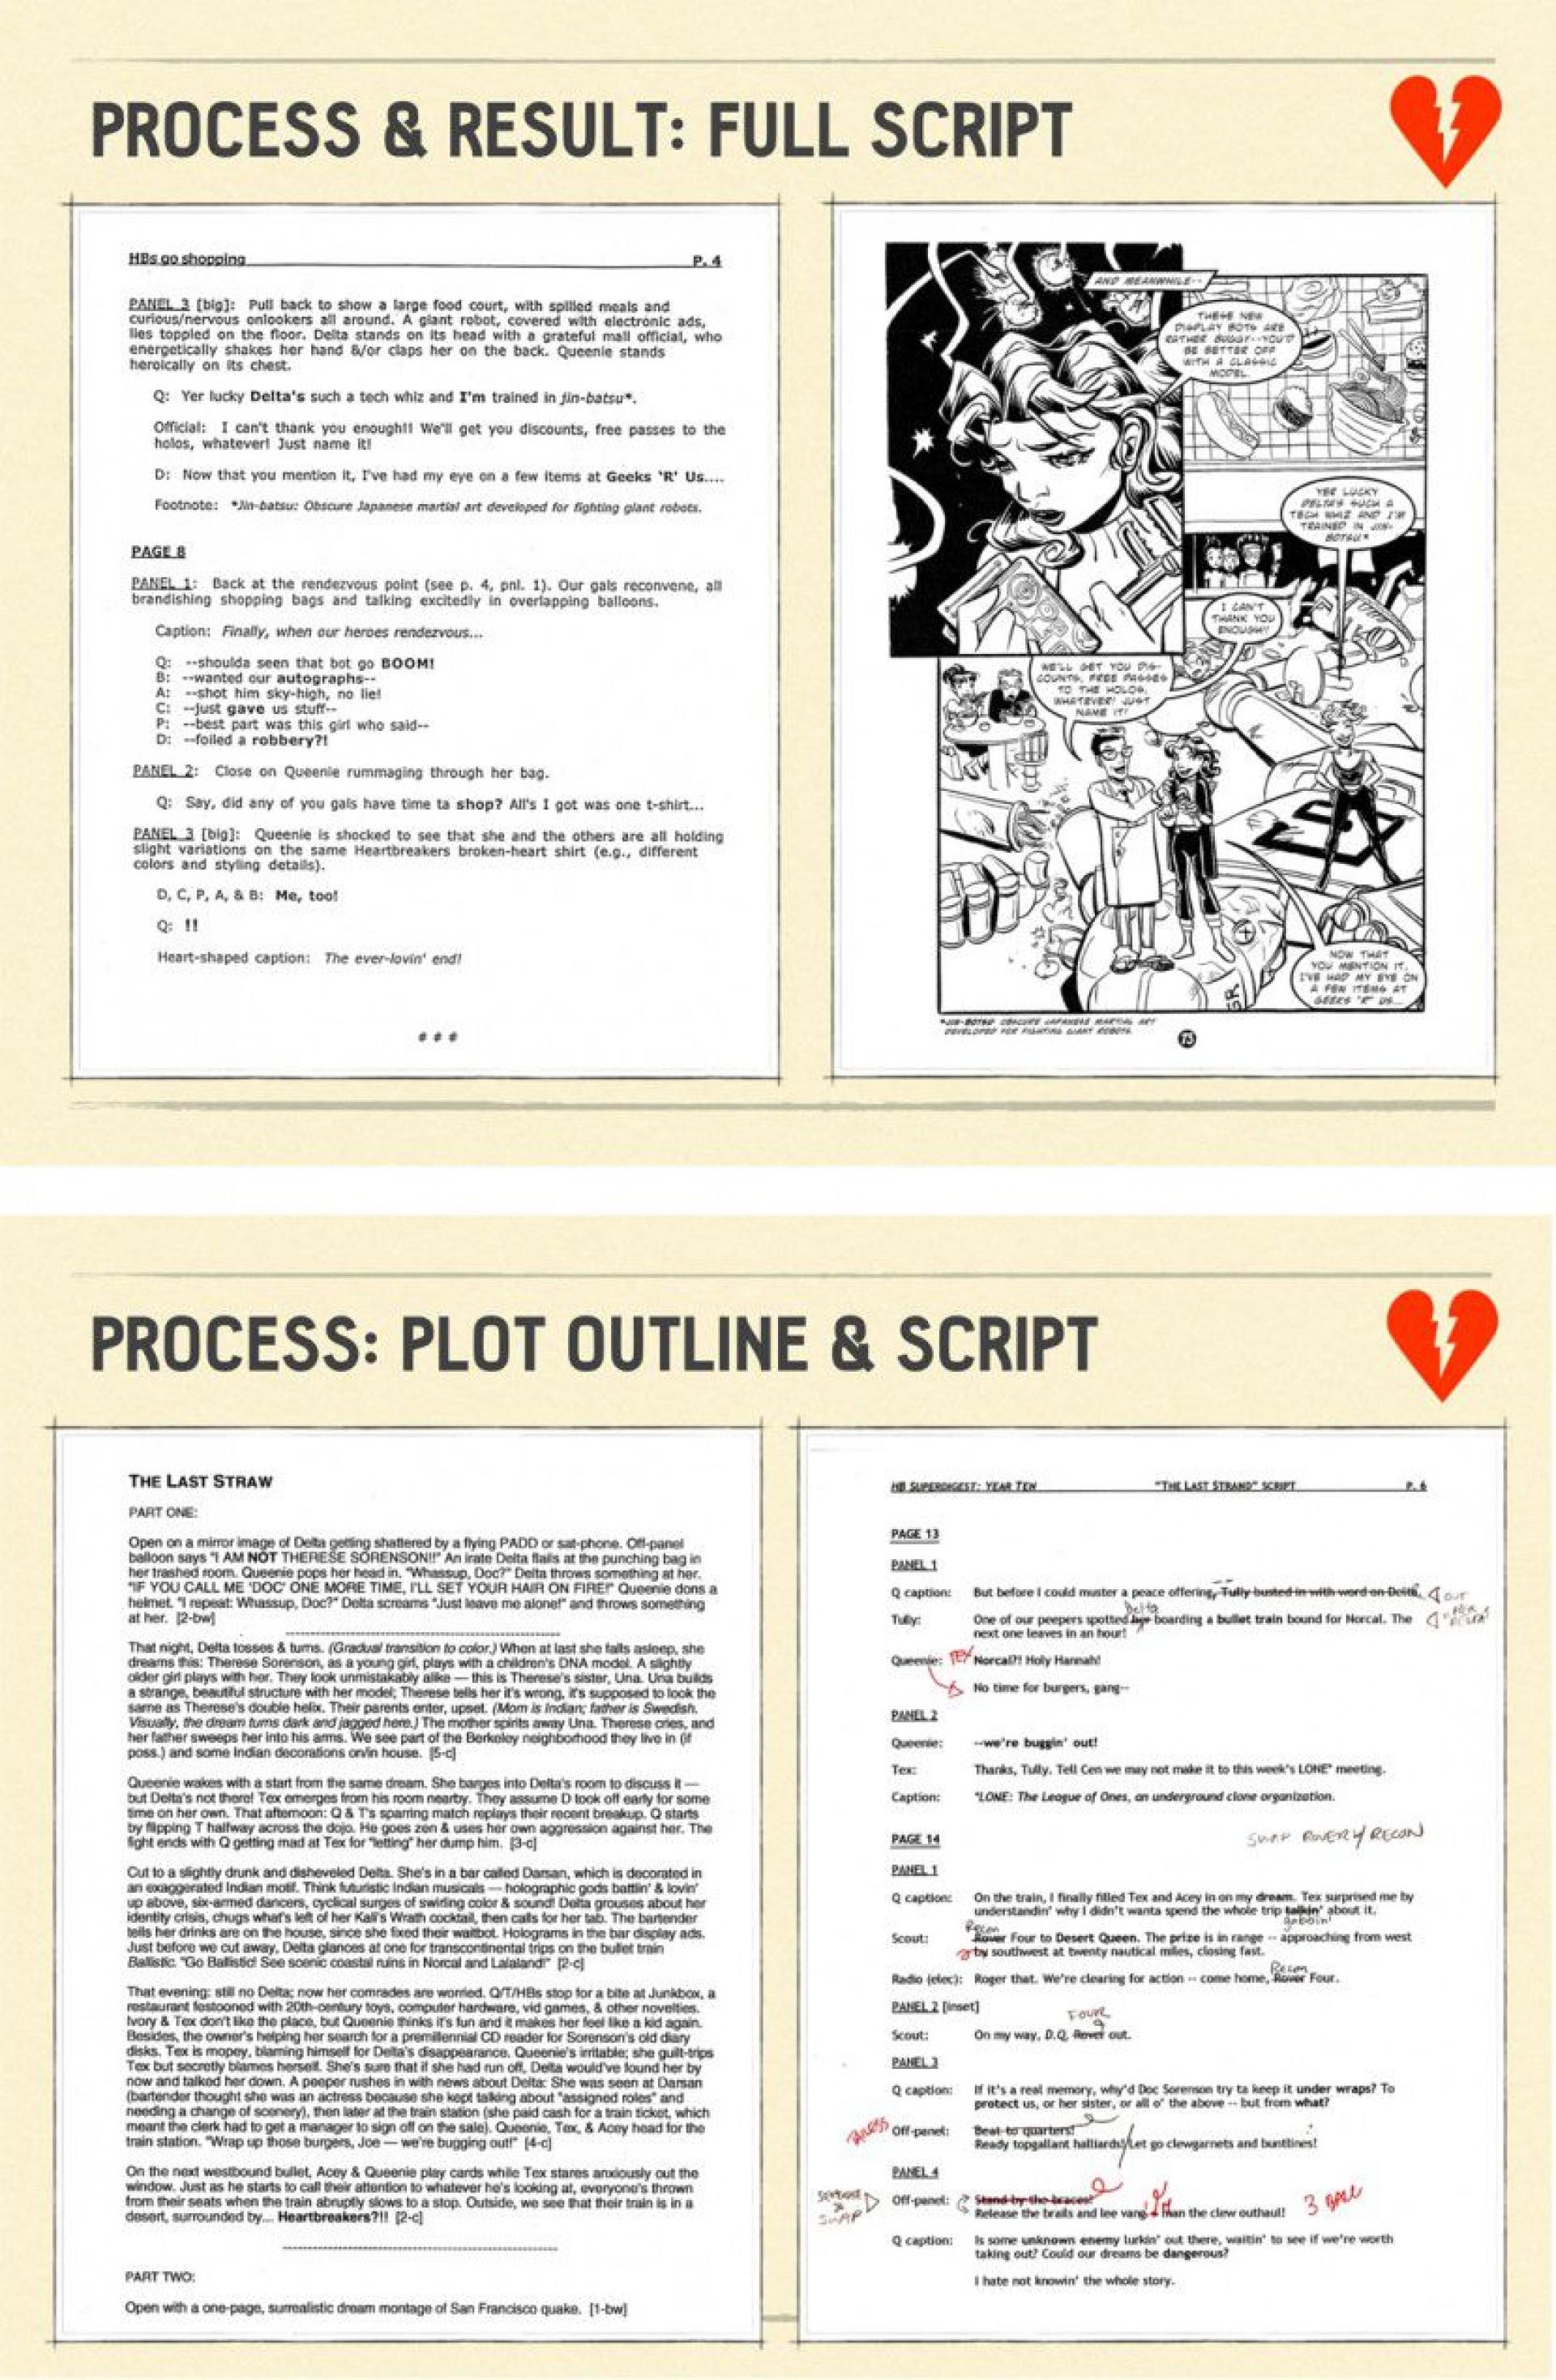 006 Impressive Comic Book Script Writing Format Inspiration  Example1920